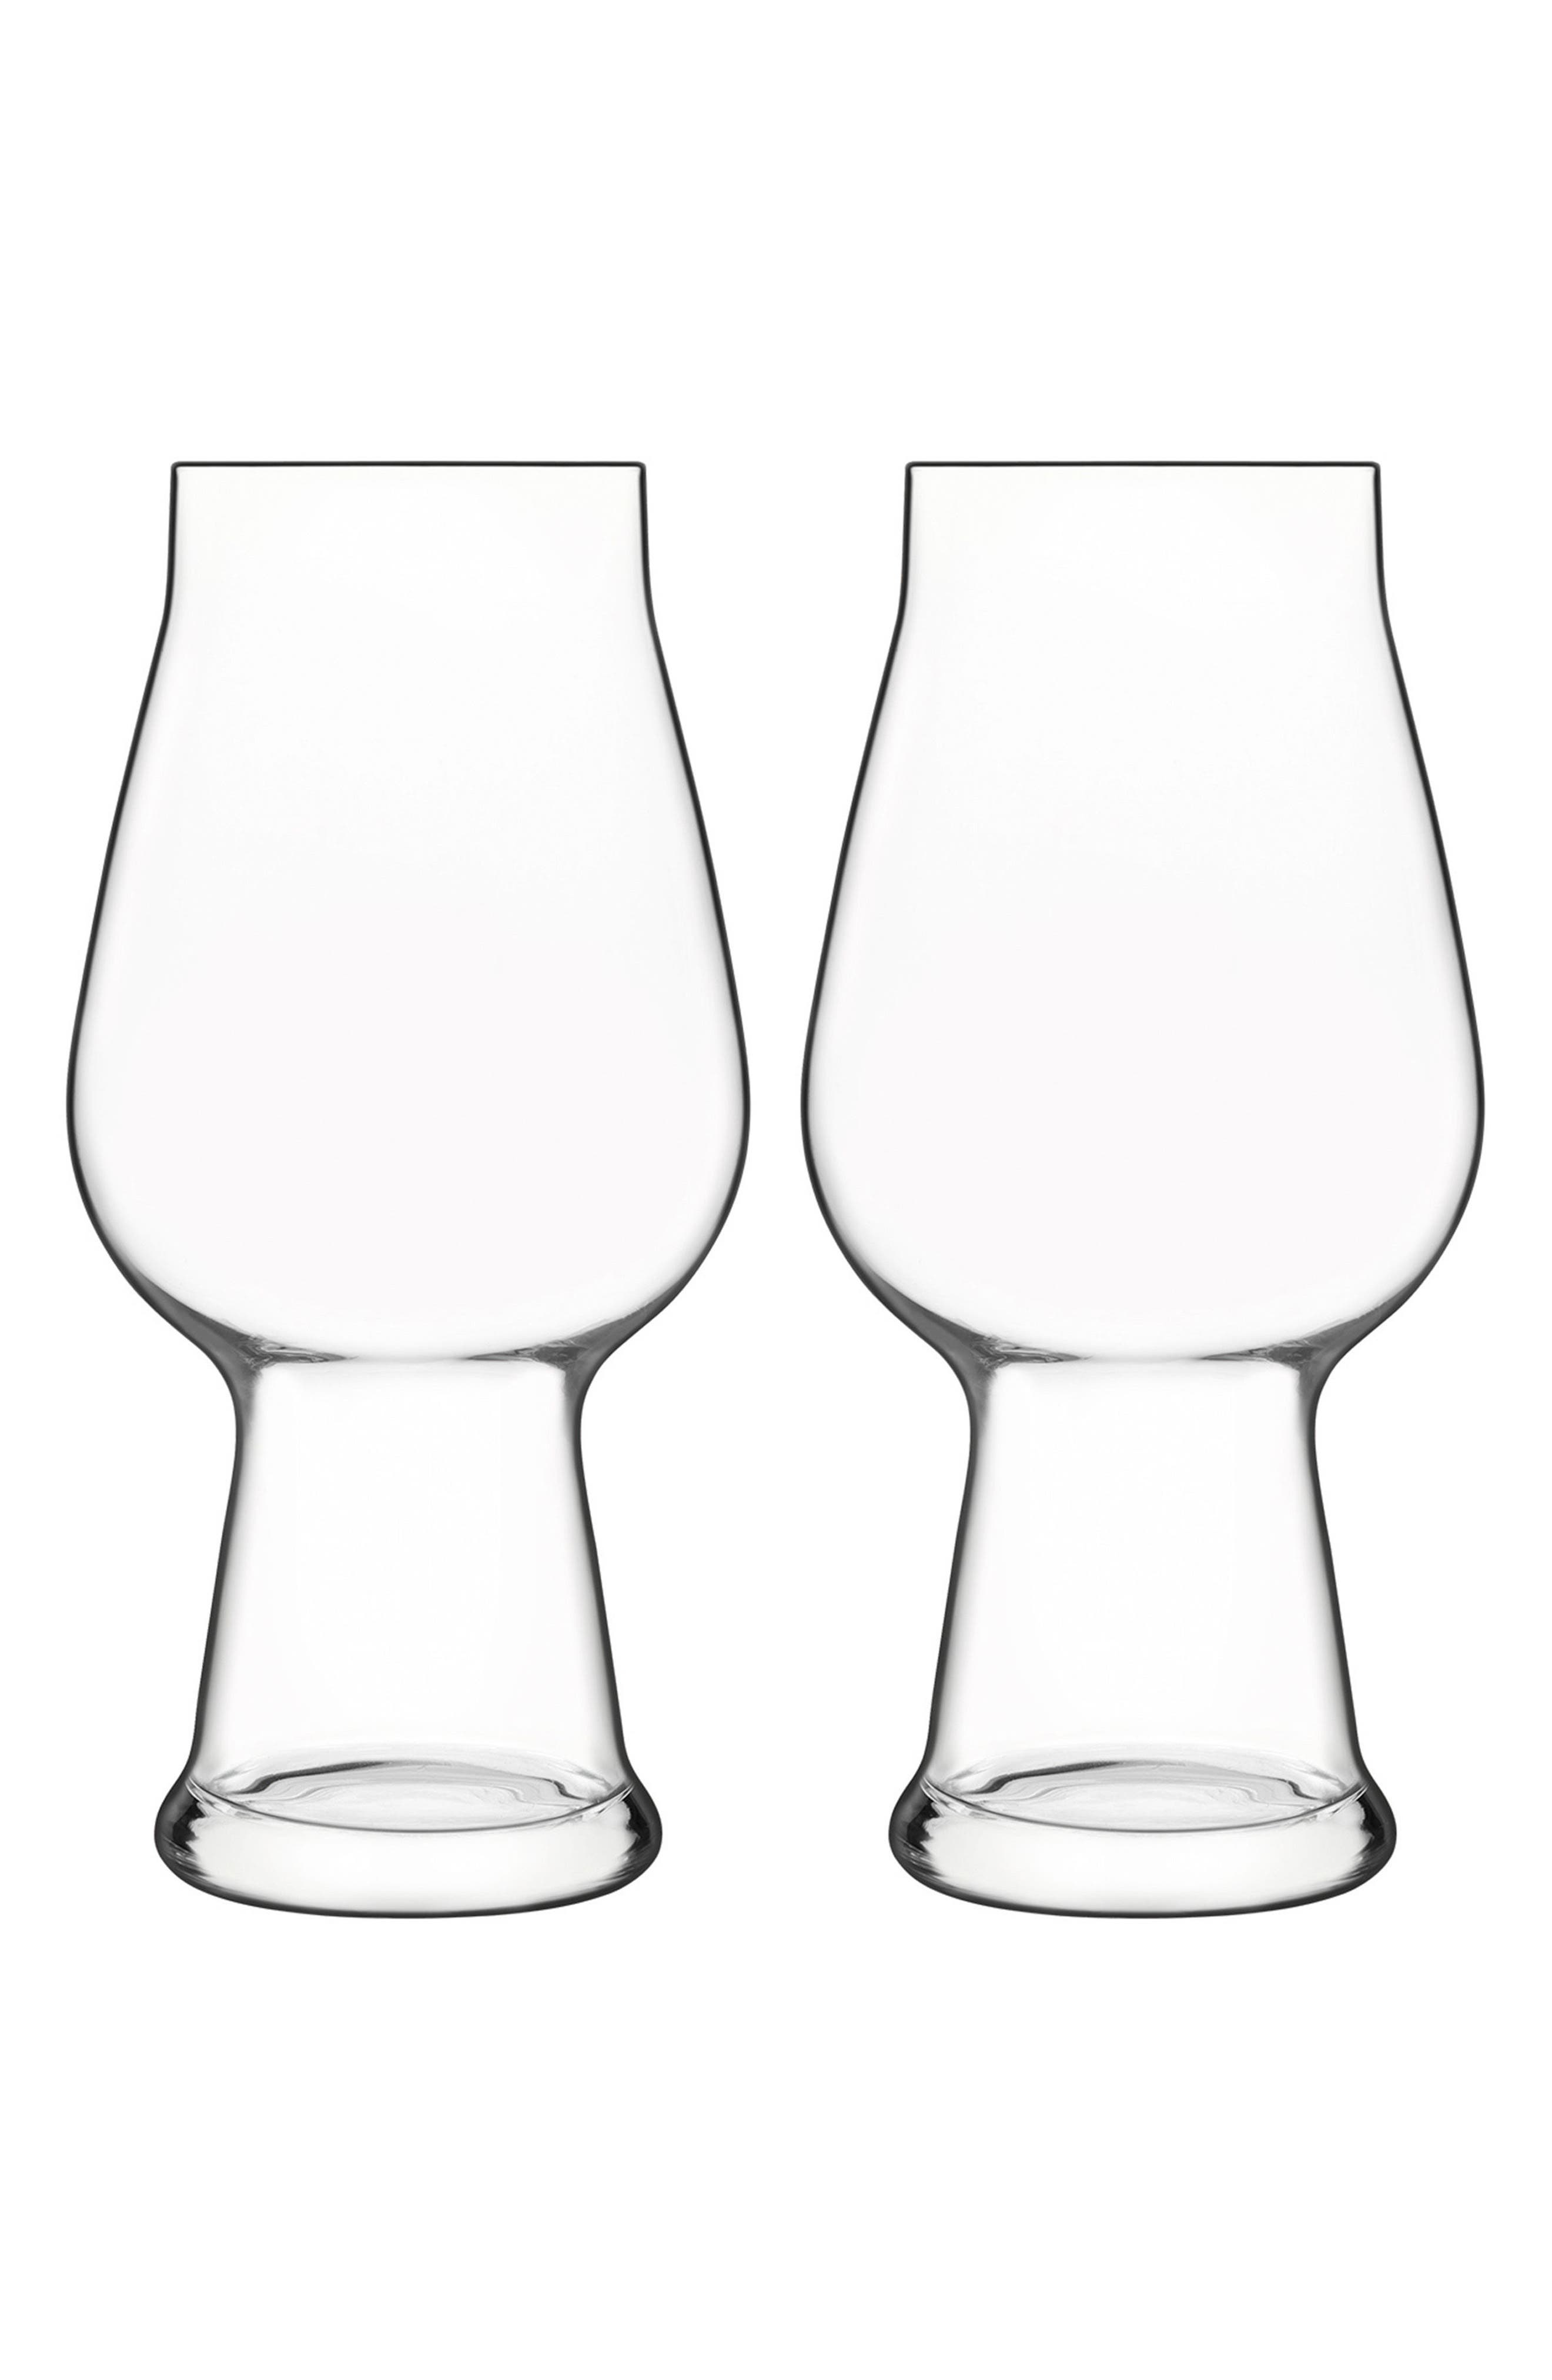 Main Image - Luigi Bormioli Birrateque Set of 2 IPA Glasses